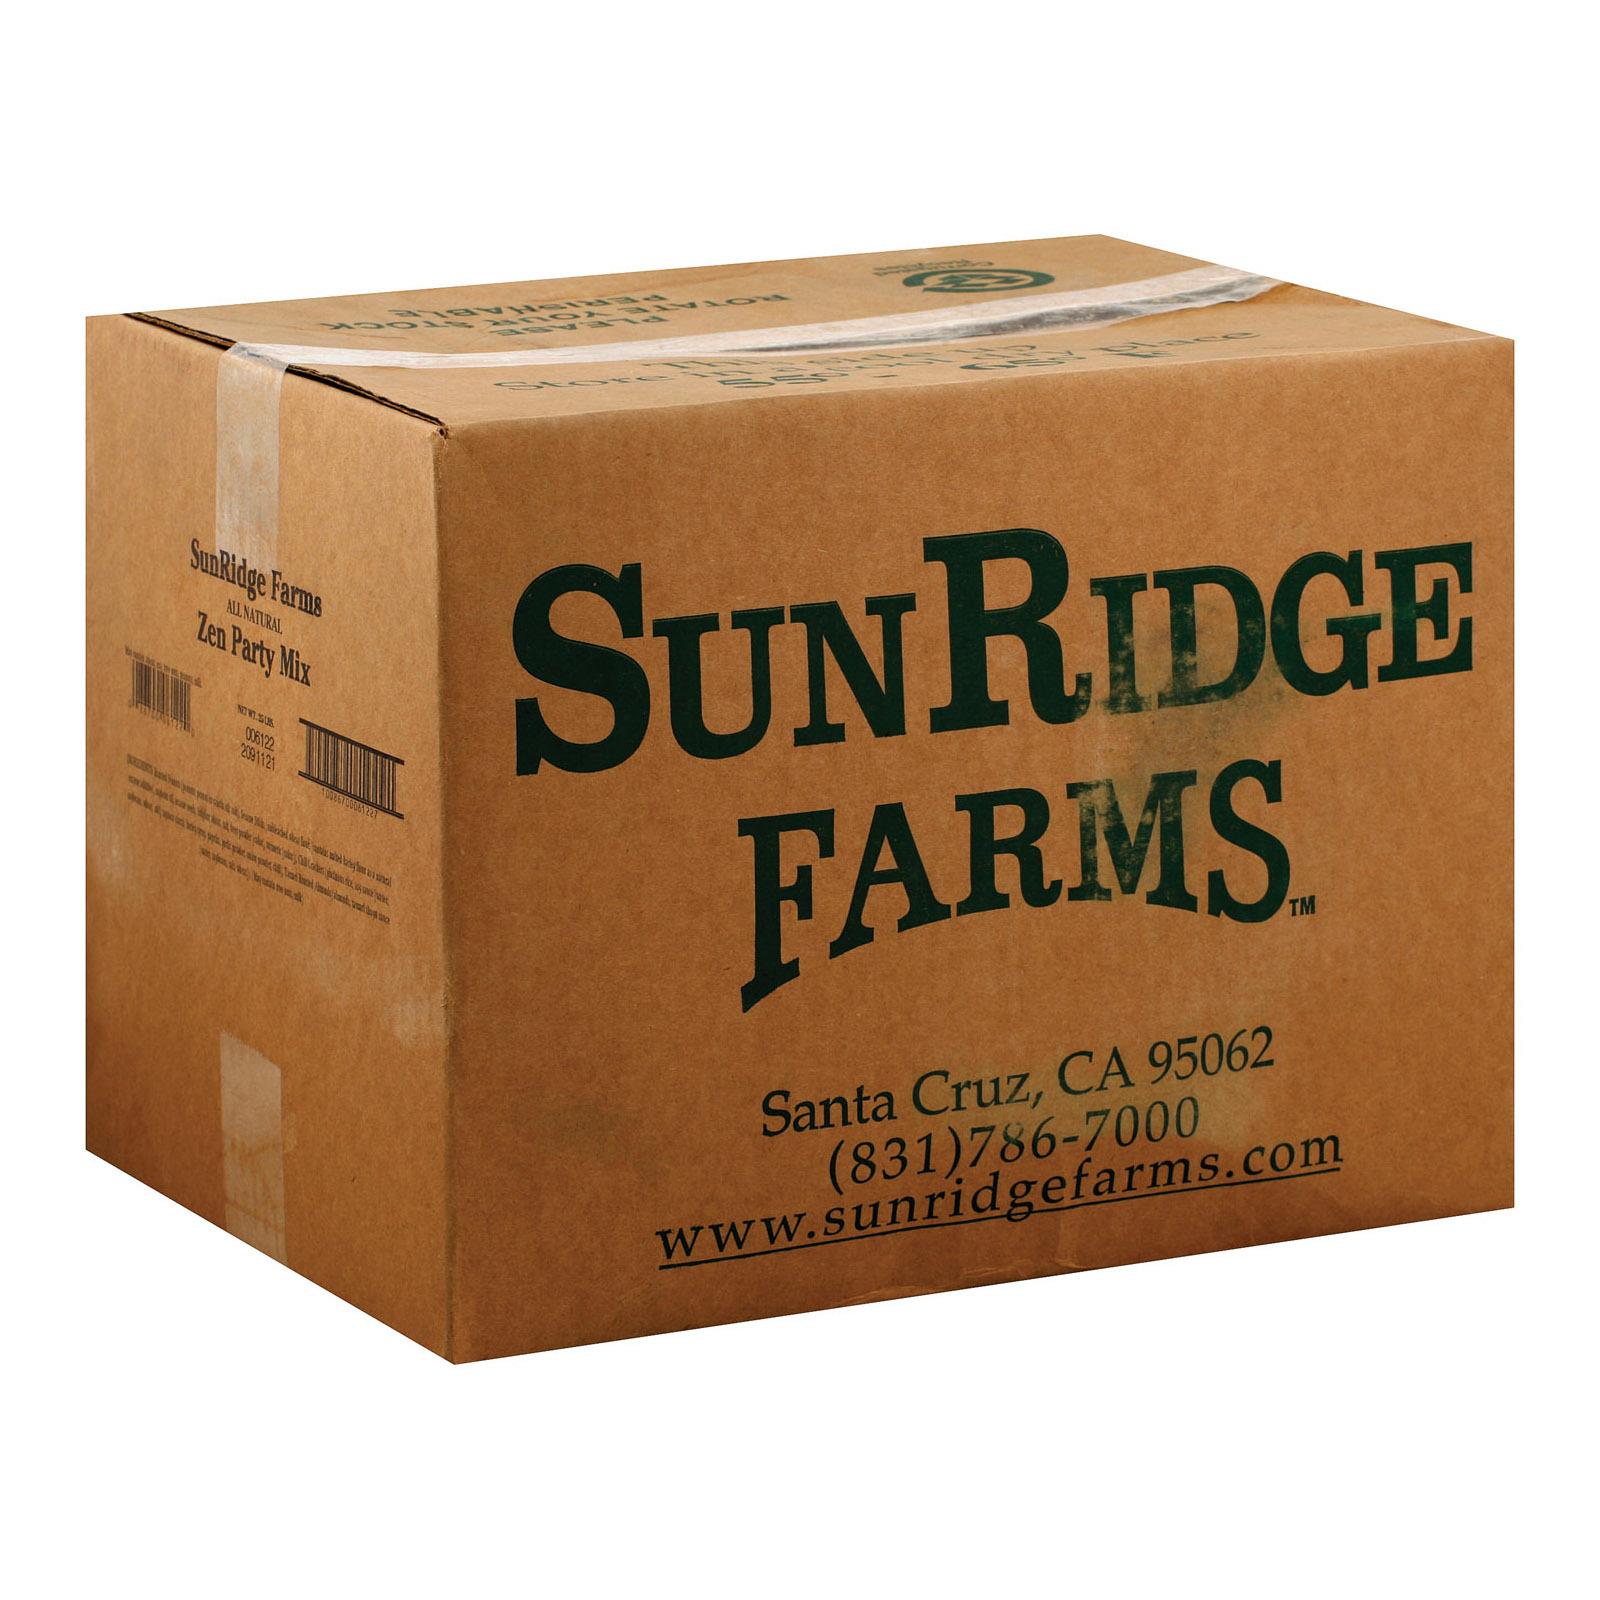 Sunridge Farms All Natural Zen Party Mix - 25 lb.